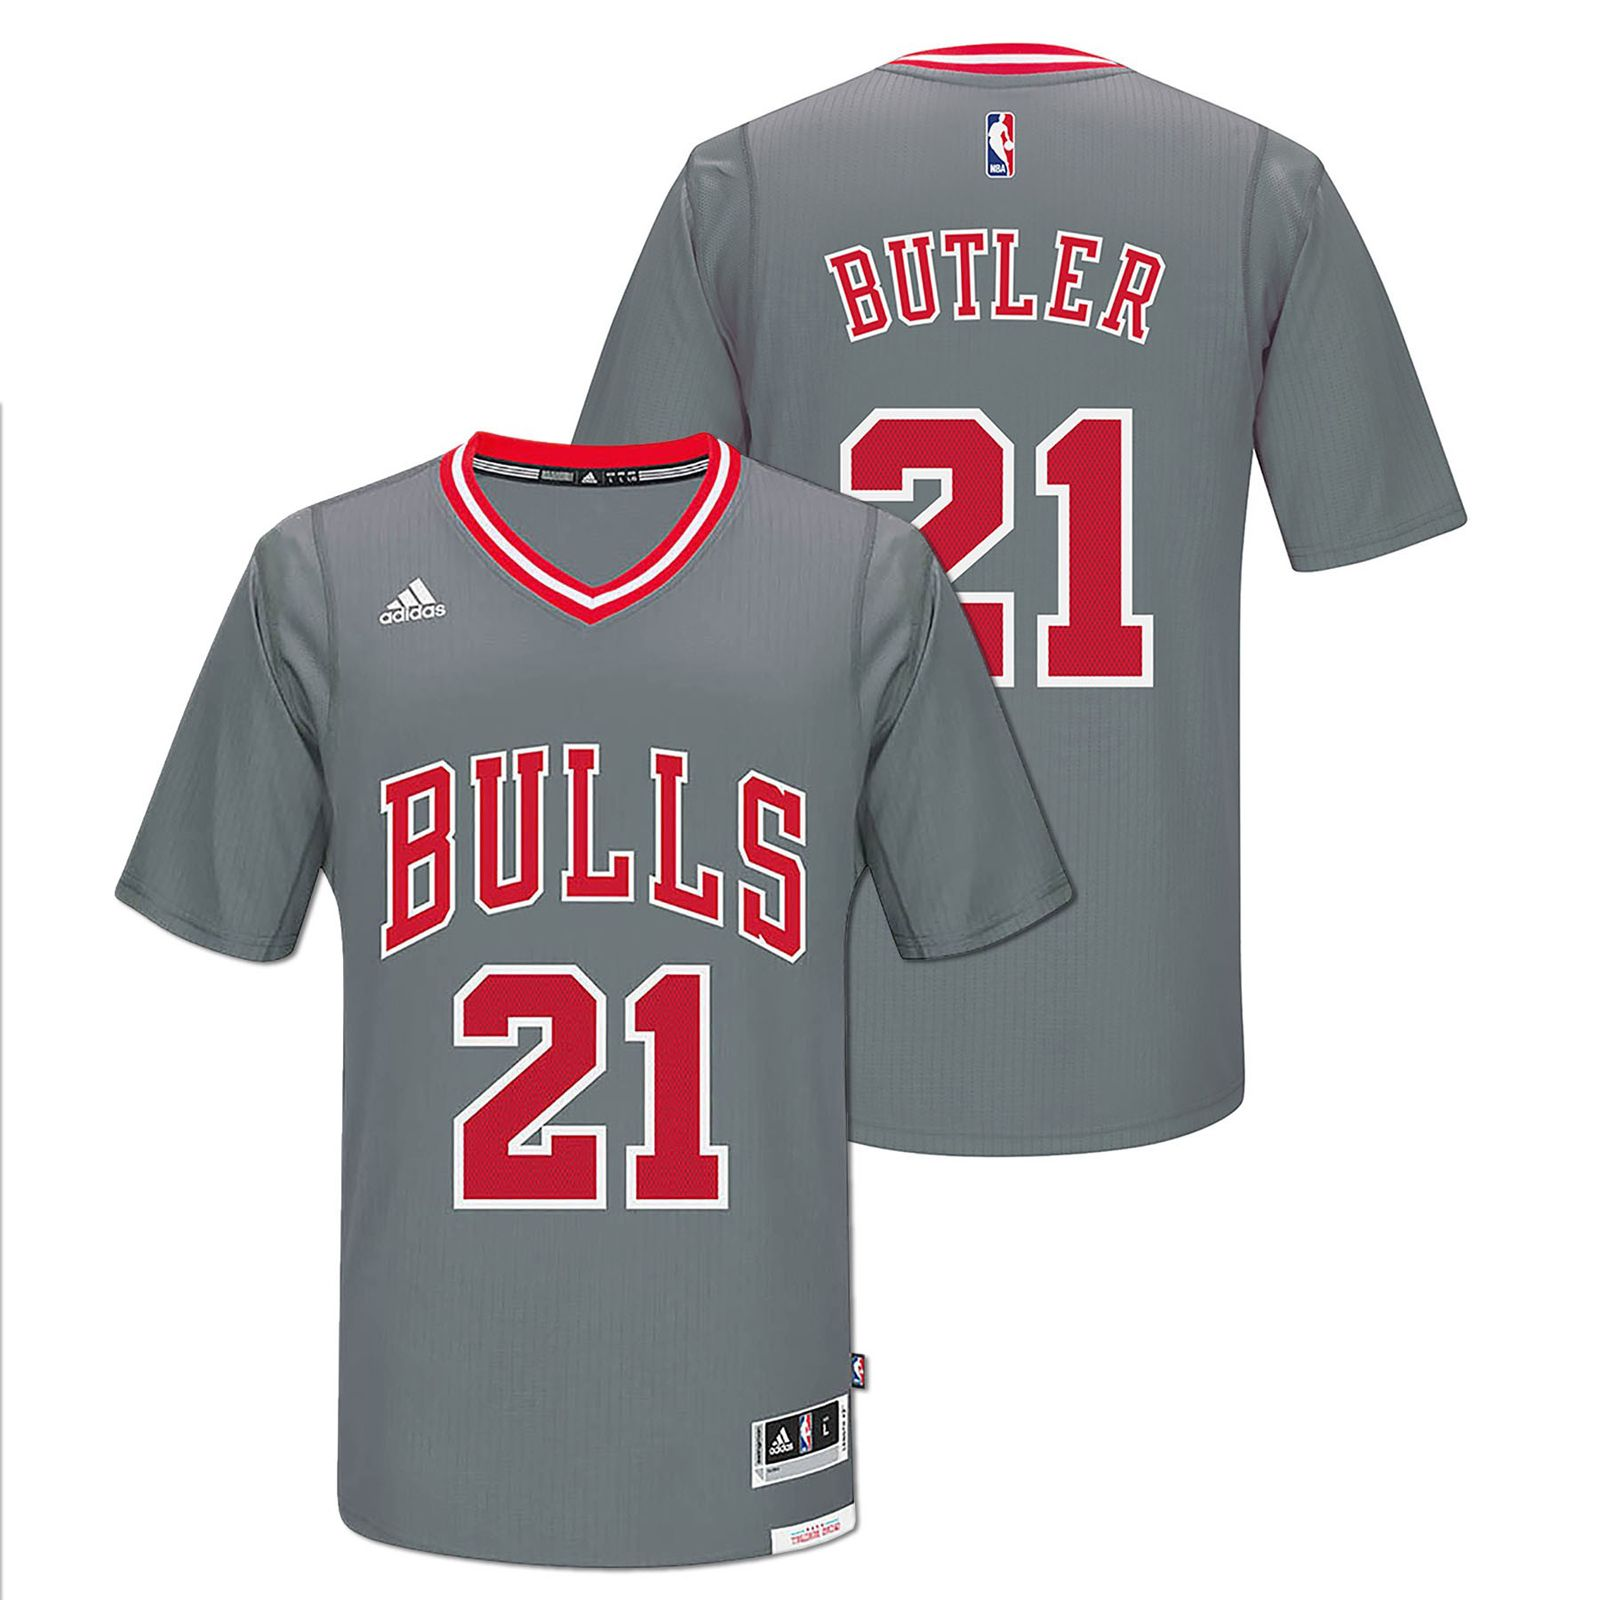 100% authentic 8673f 62148 Chicago Bulls Men's Grey Jimmy Butler Swingman Jersey with ...